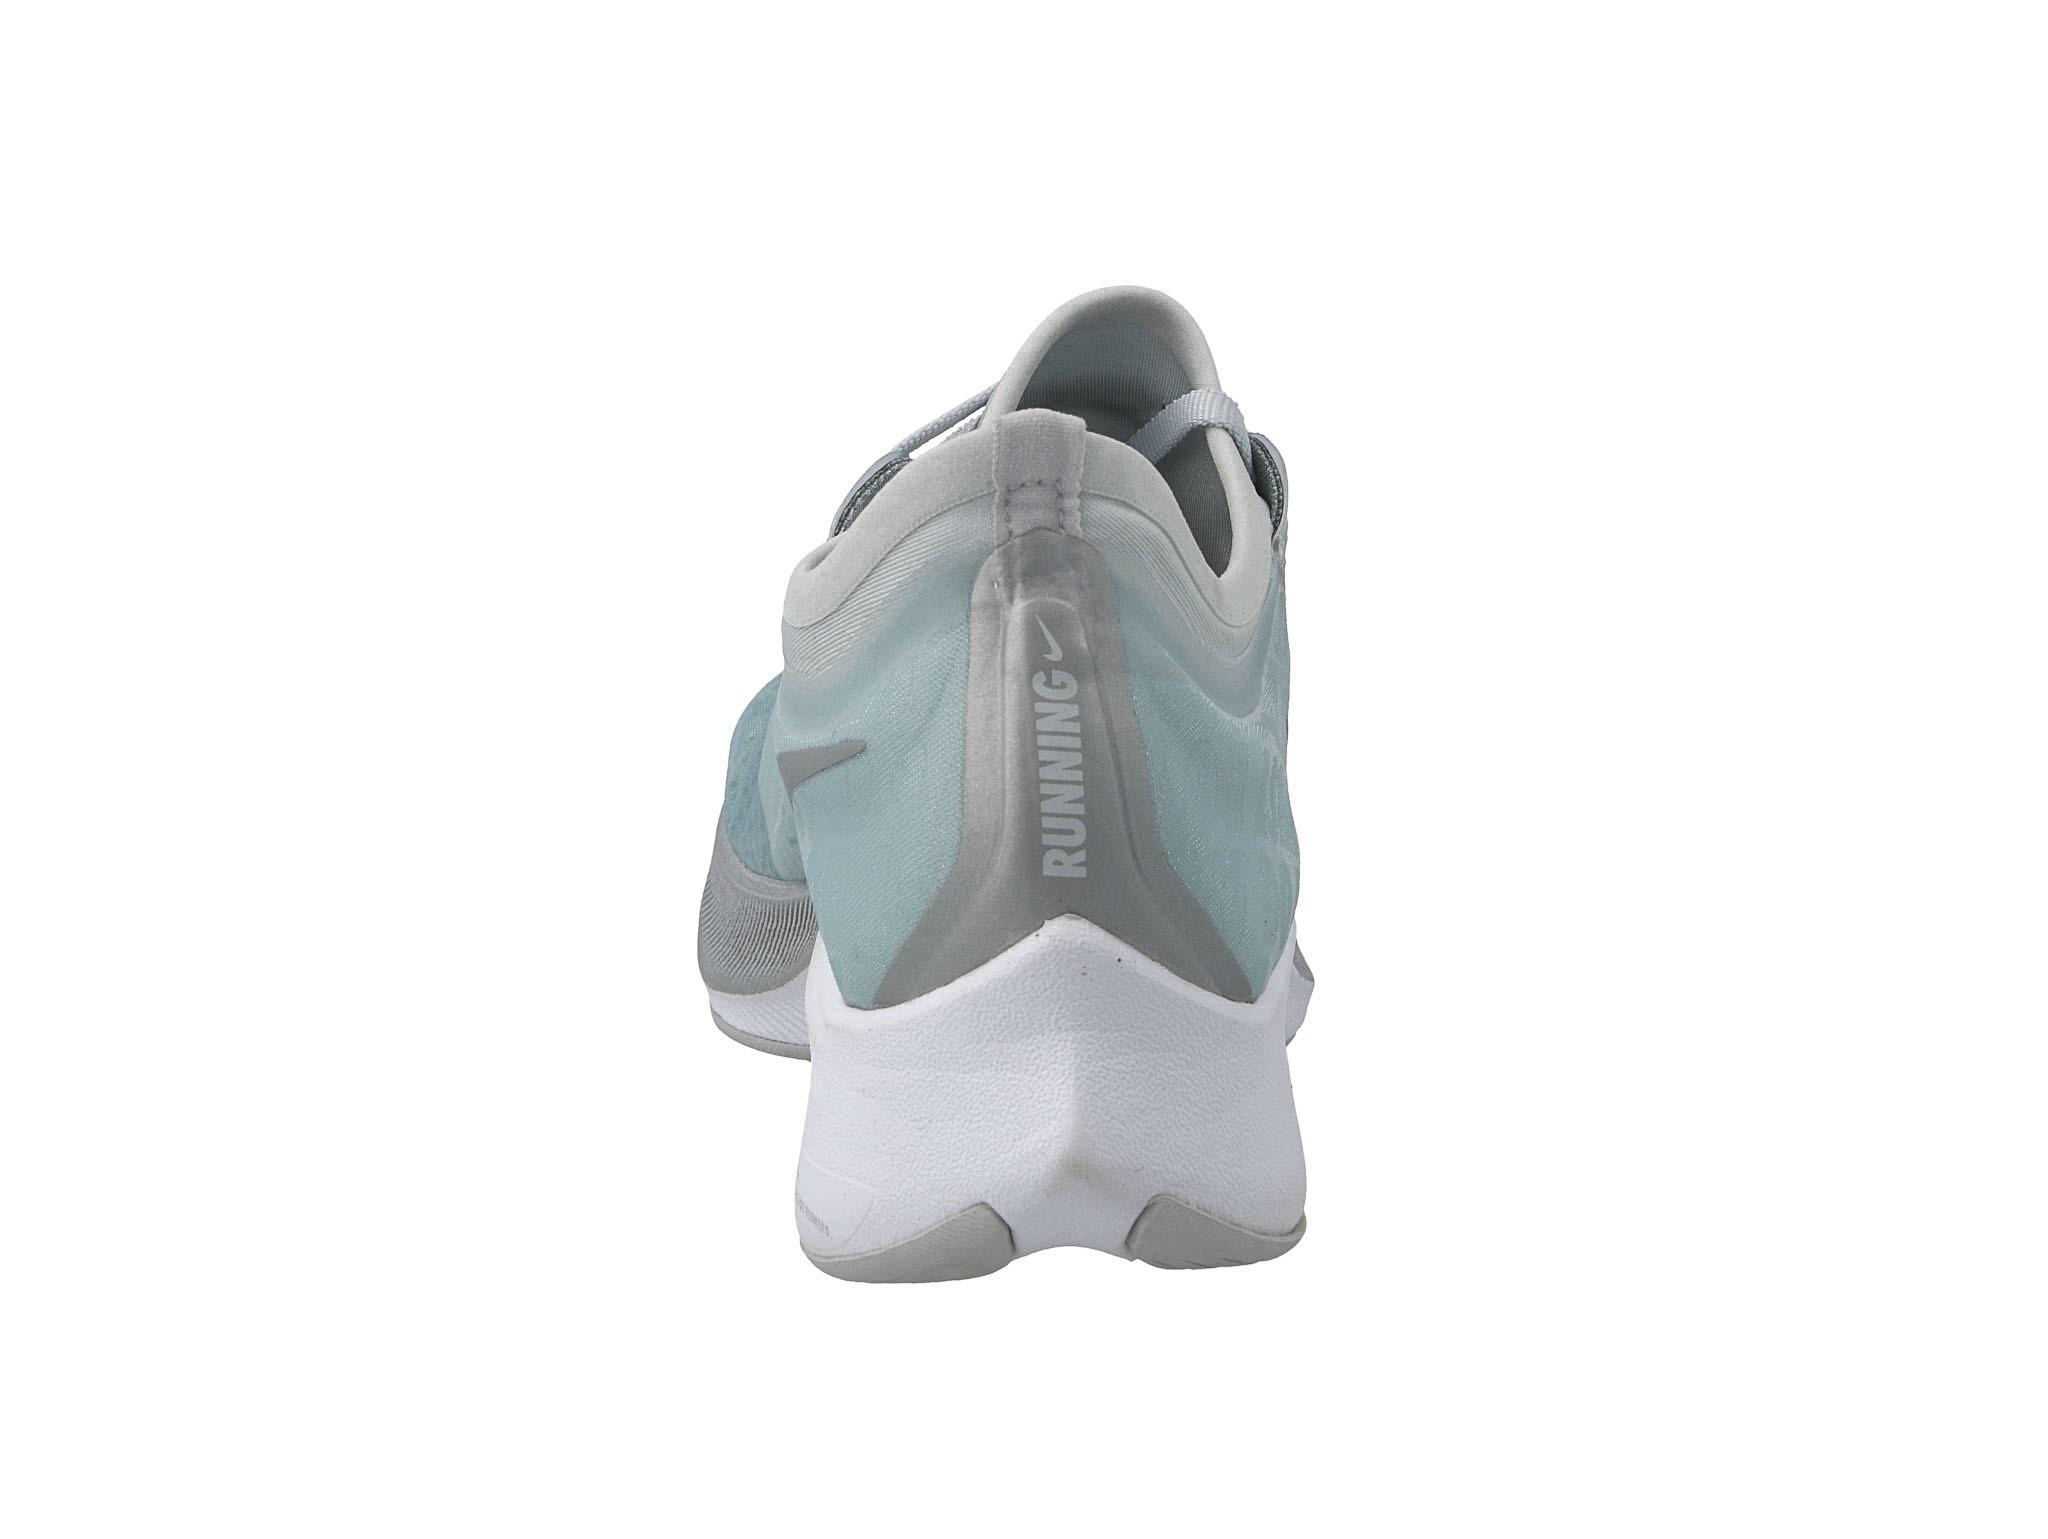 Cipő NIKE Zoom Fly 3 AT8241 302 Ocean CubeMetallic Silver